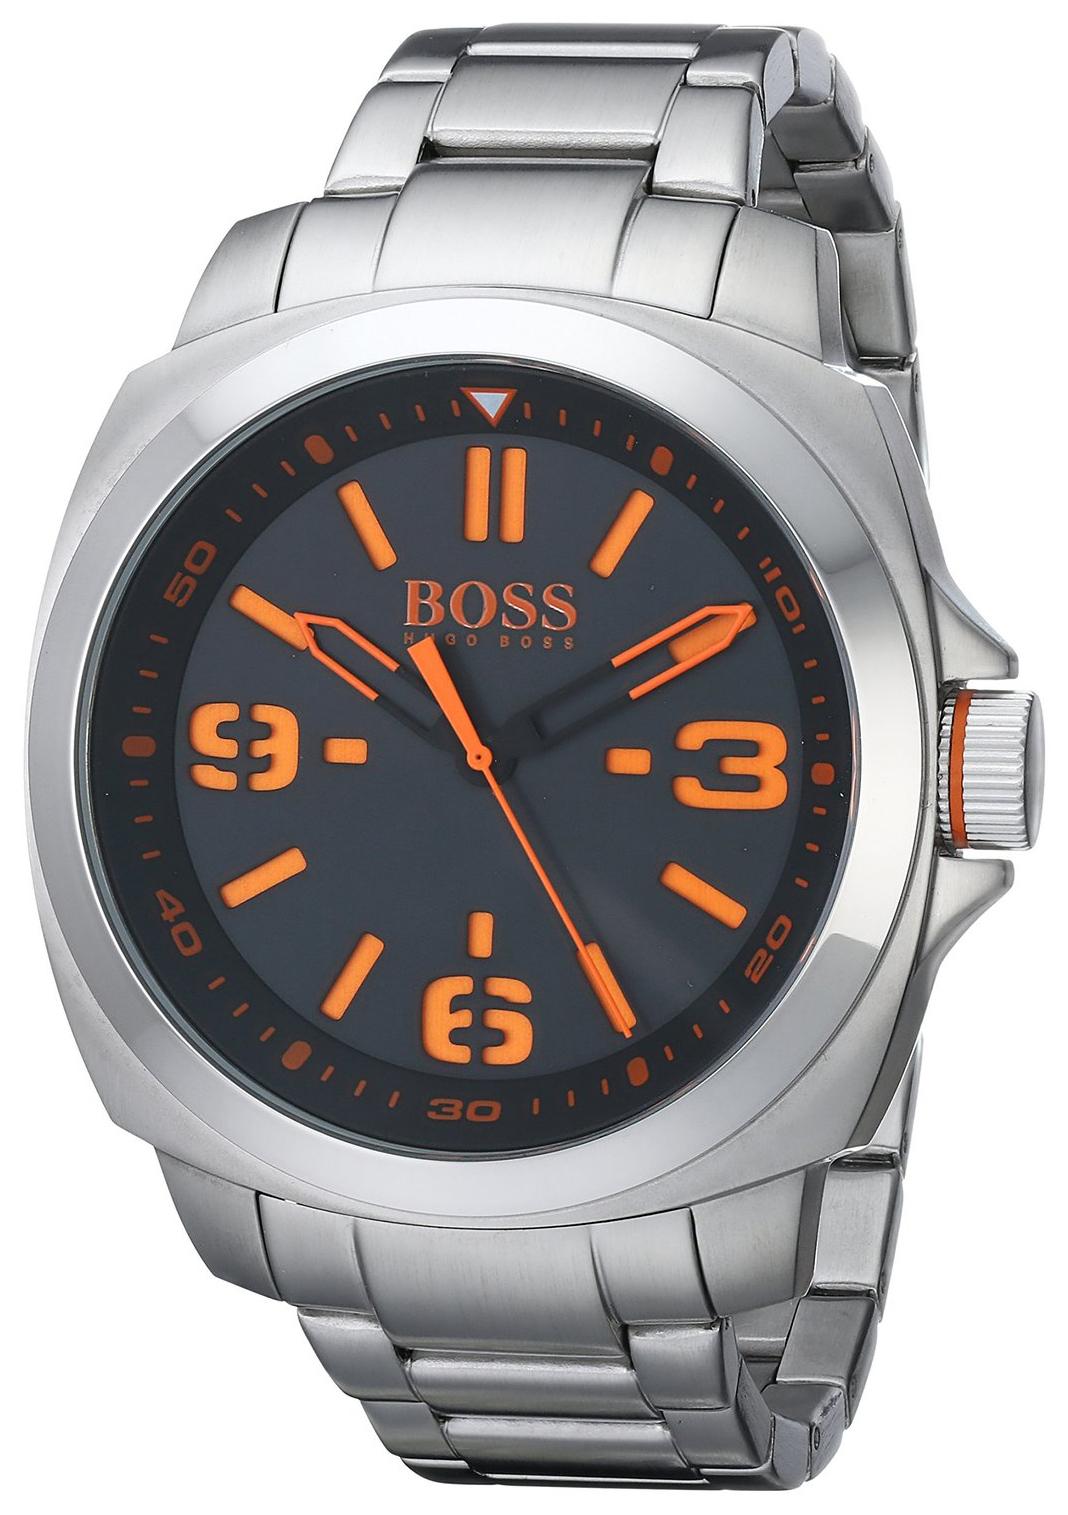 Hugo Boss Brisbane Herrklocka 1513099 Svart/Stål Ø46 mm - Hugo Boss